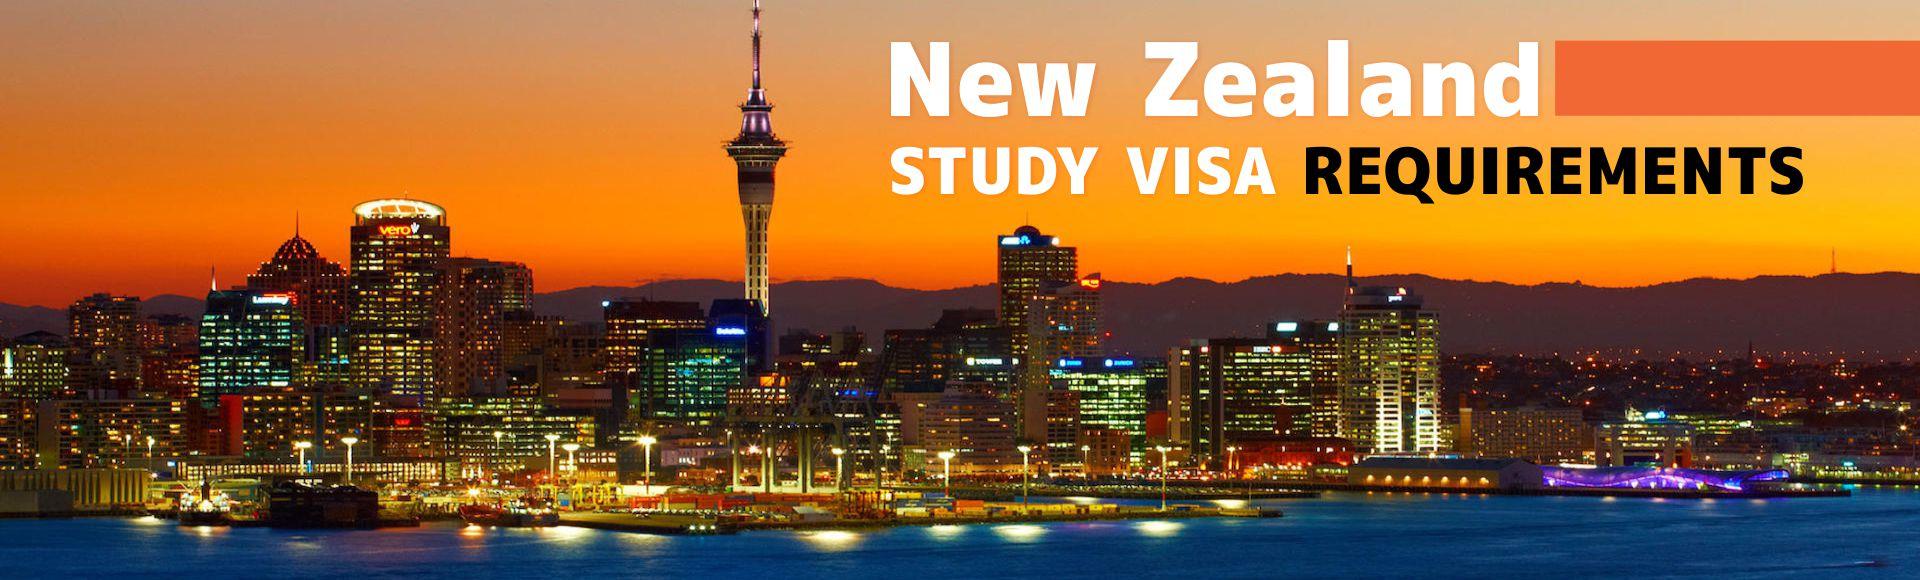 New Zealand Study Visa Requirements